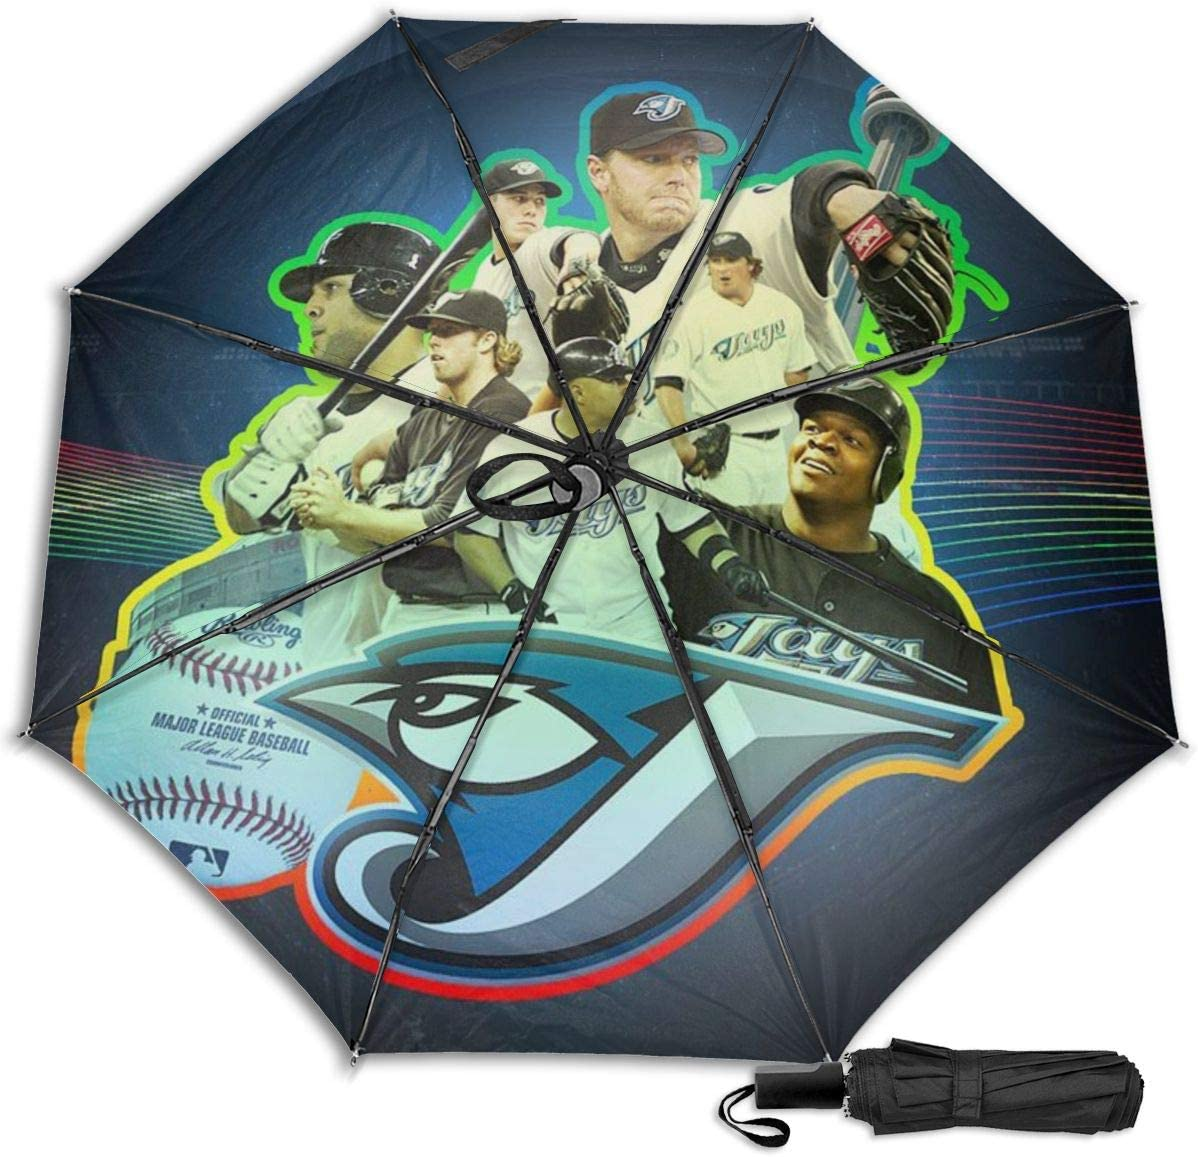 Lovesofun Portable Manual Umbrella Toron-to Blue Jay-s Compact Folding Business Umbrellas UV Protection Manual Tri-fold Umbrella for Men and Women